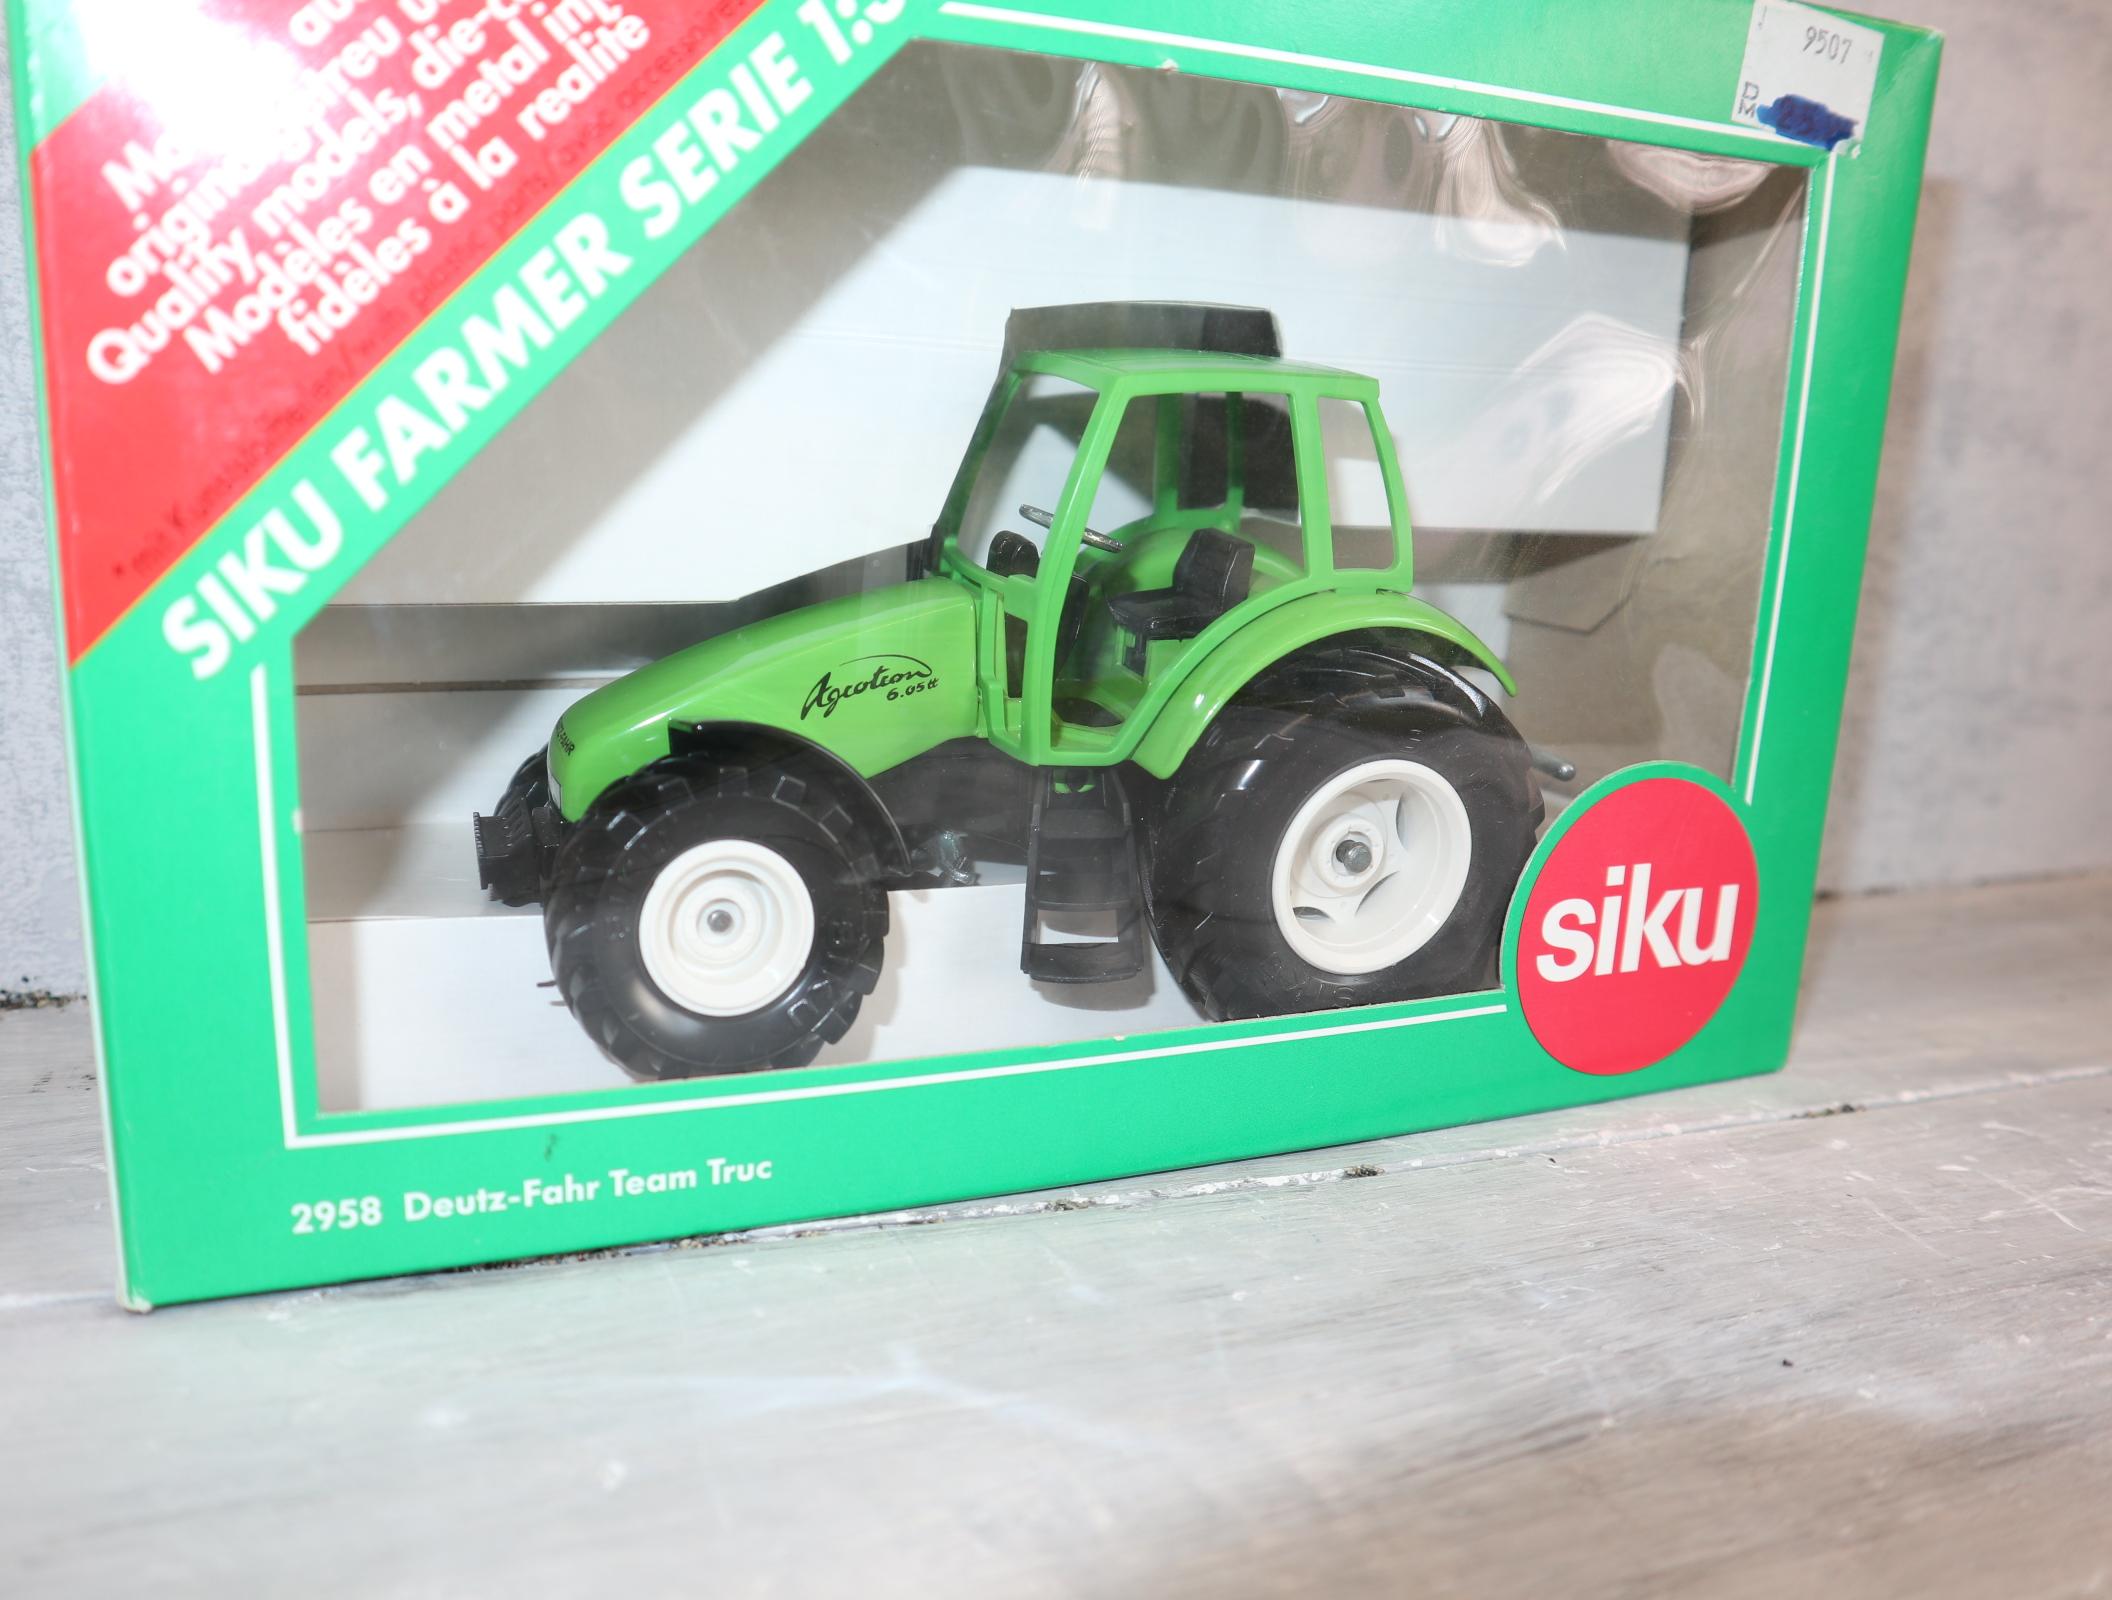 Siku 2958 1:32 Deutz Team Truc Agrotron aus 1995